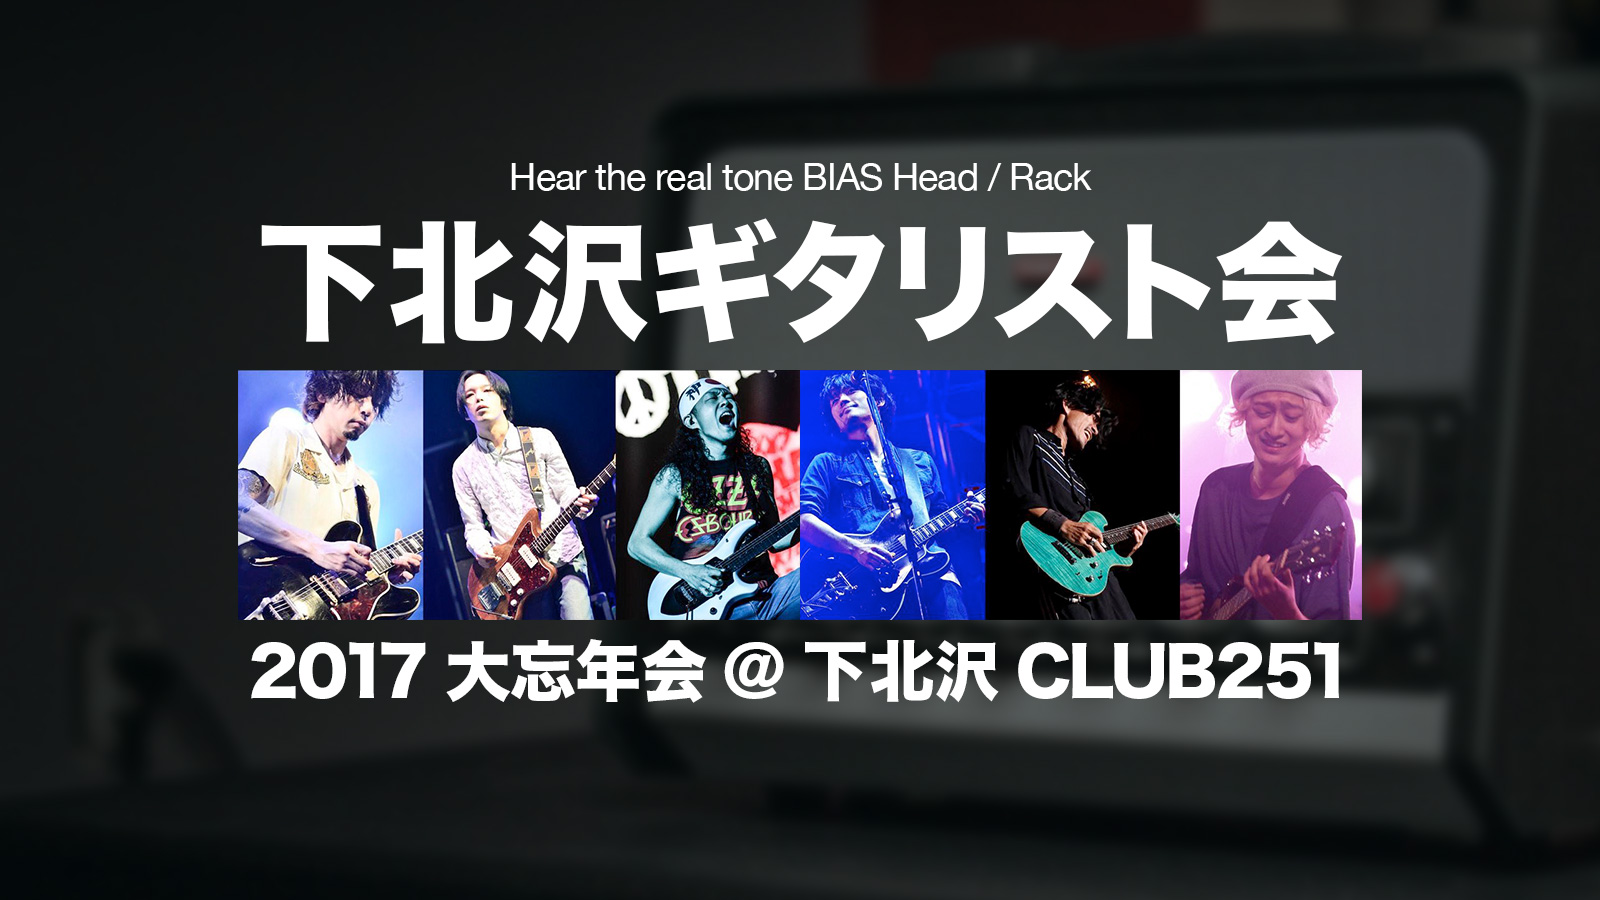 20171220_positivegrid_bias_shimokitazawa2_l1600